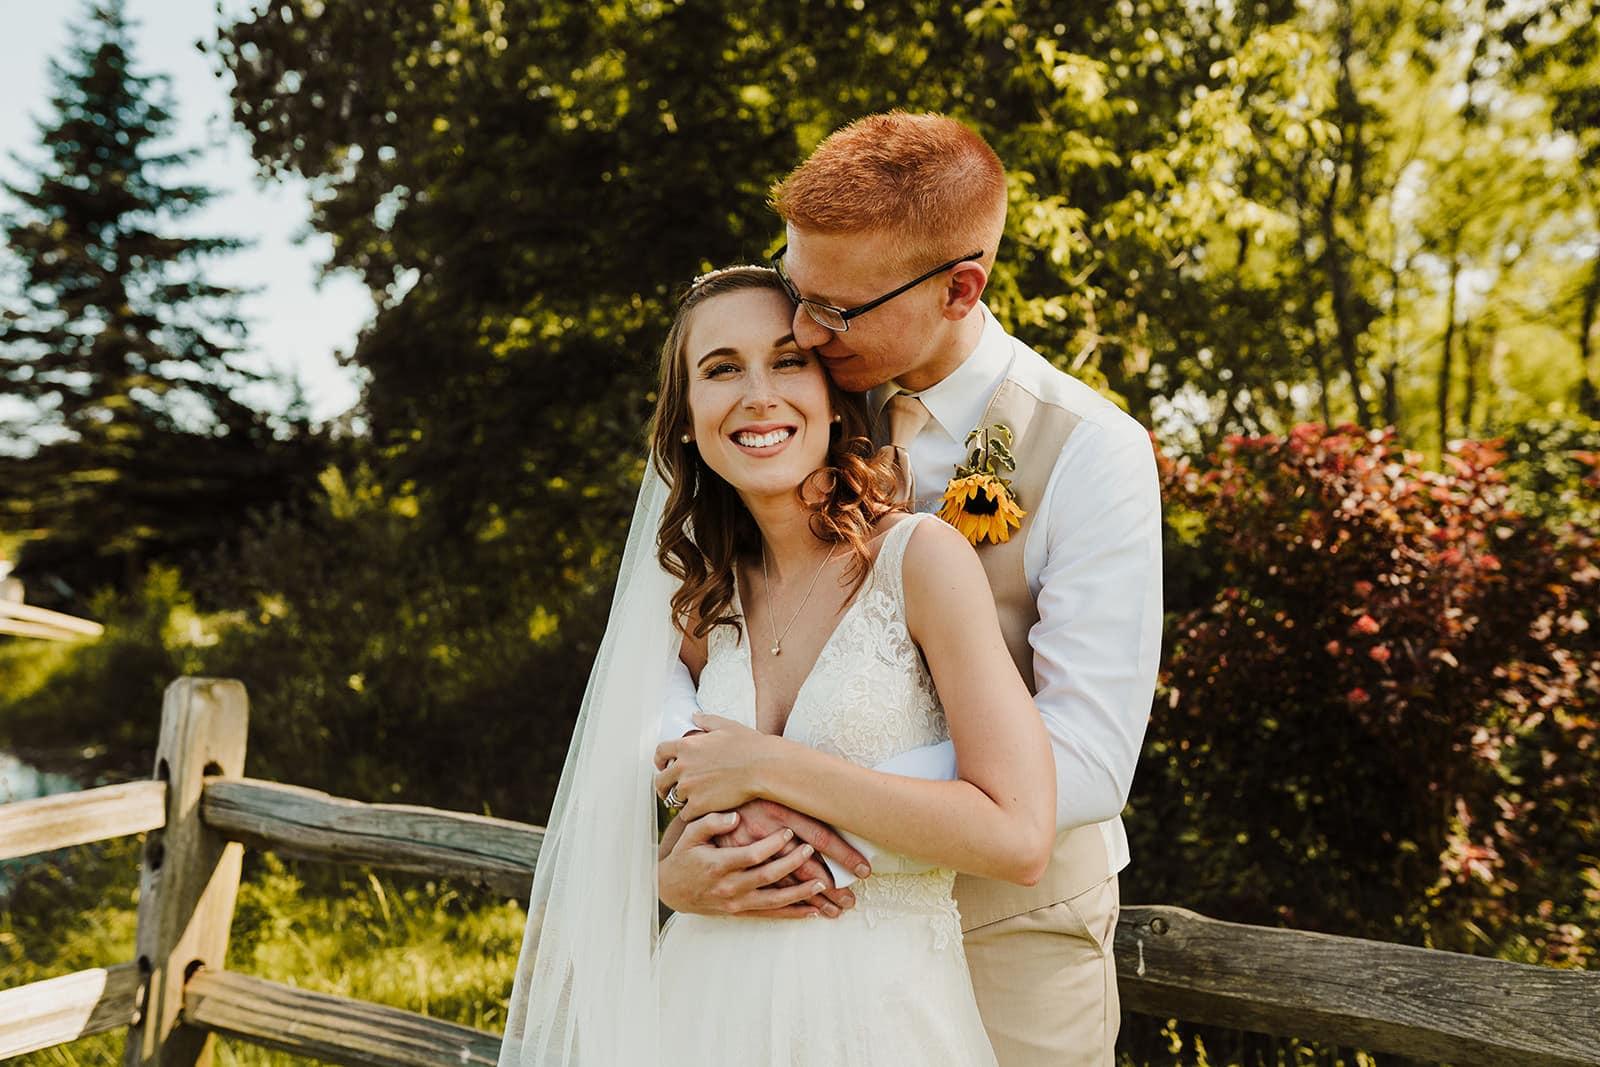 Fenton Winery and Brewery Wedding | Kelsey & Ryan